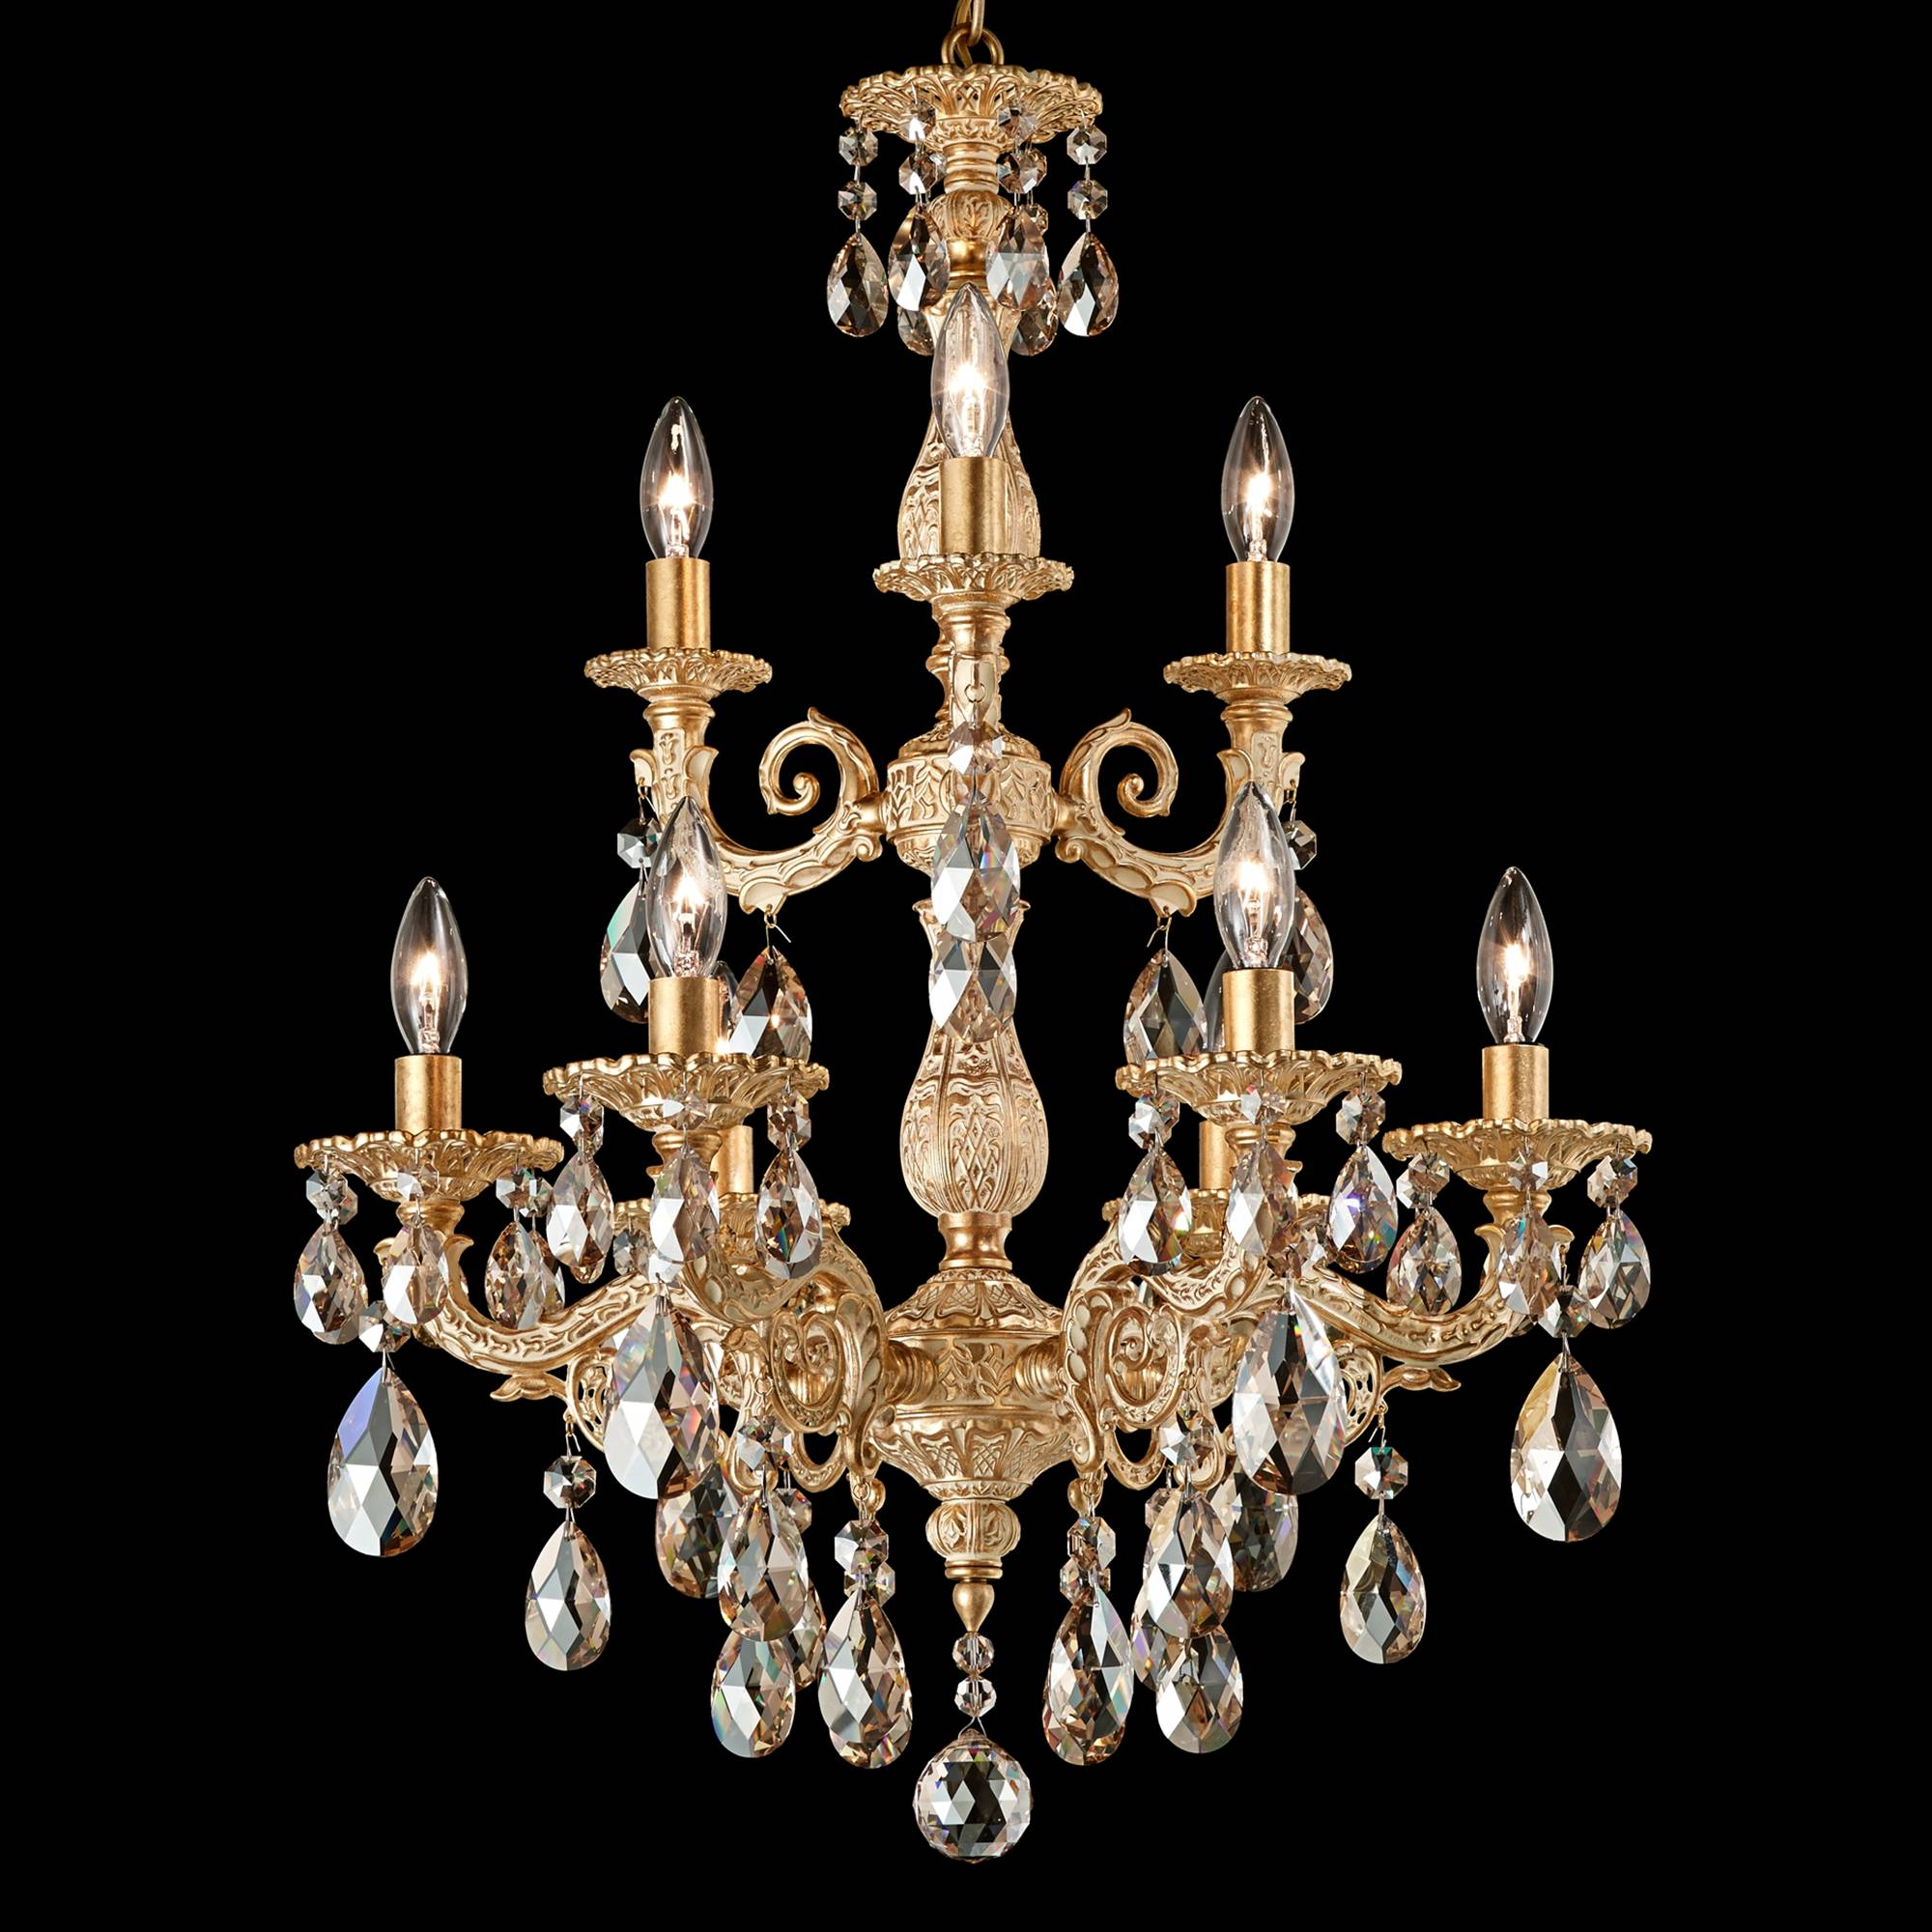 Schonbek Century Collection 30 Quot Wide Crystal Chandelier